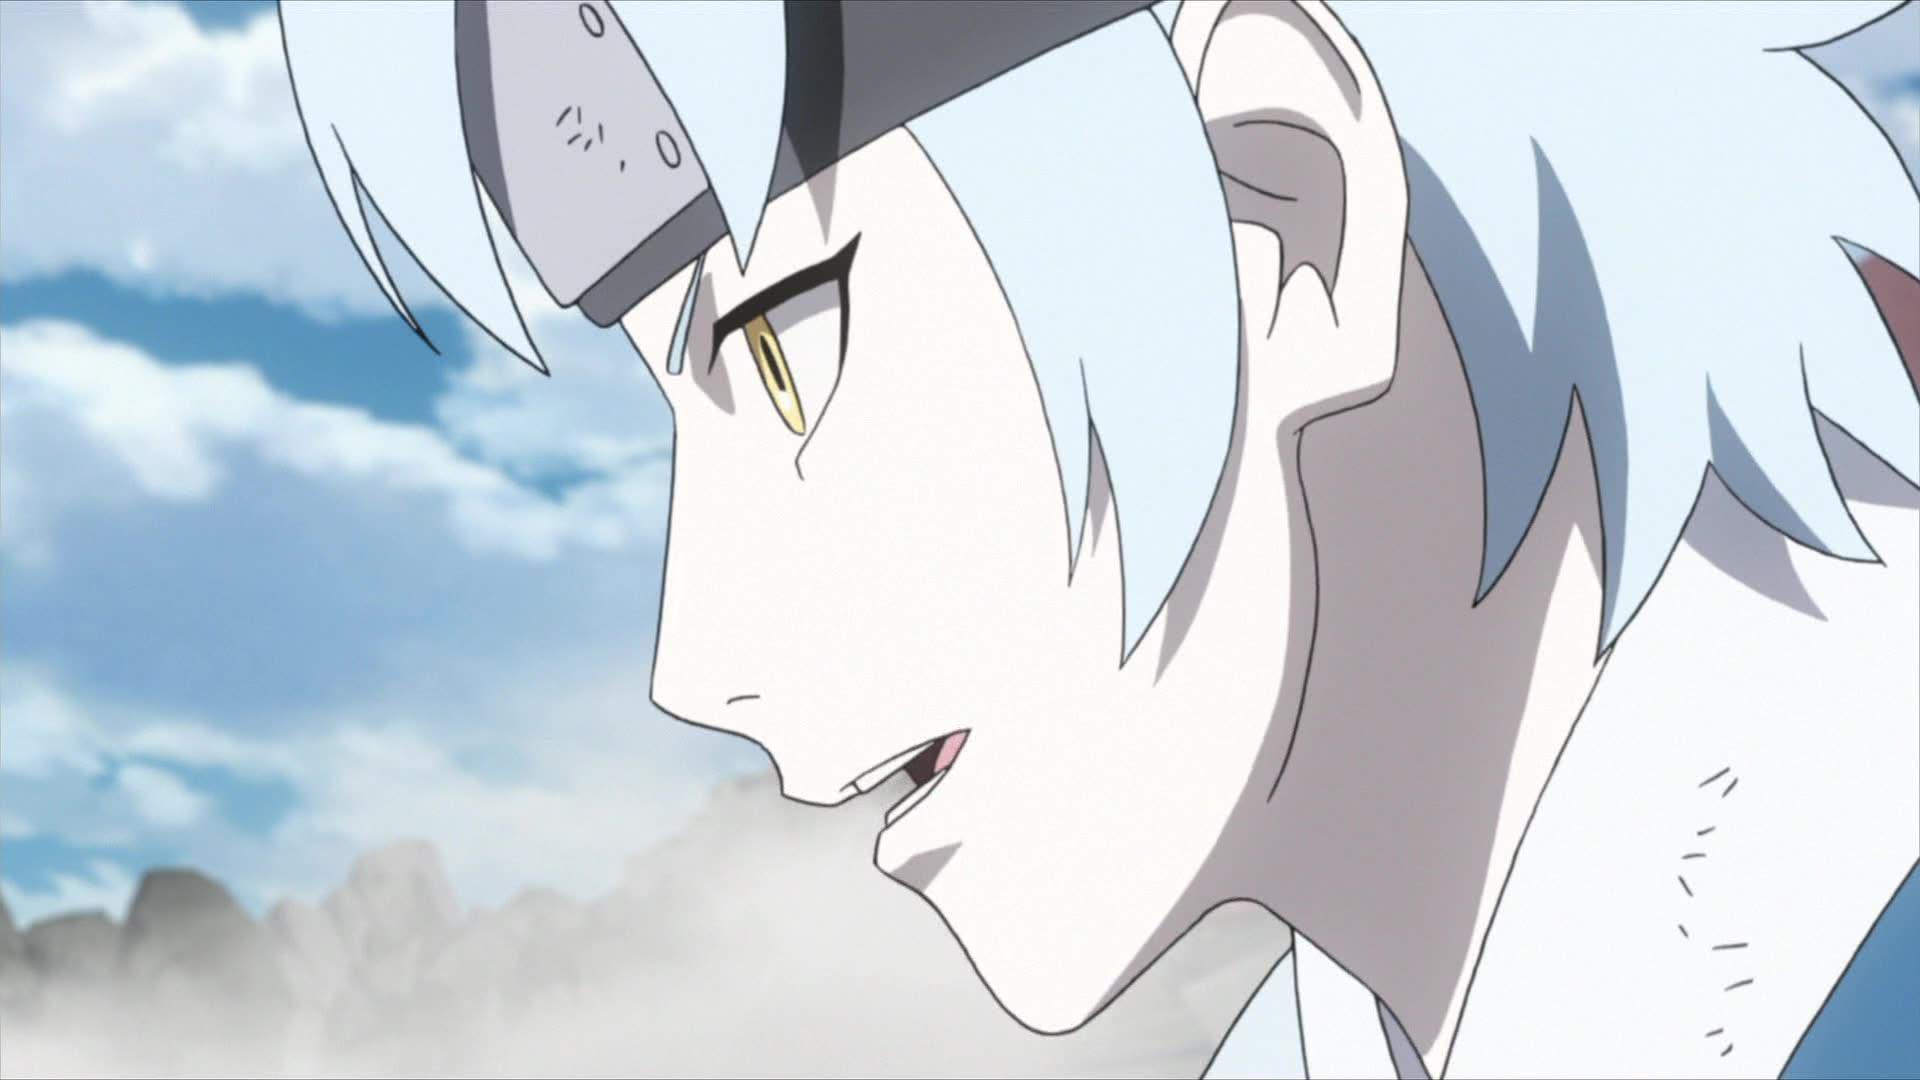 BORUTO: NARUTO NEXT GENERATIONS Episode 62, The Otsutsuki